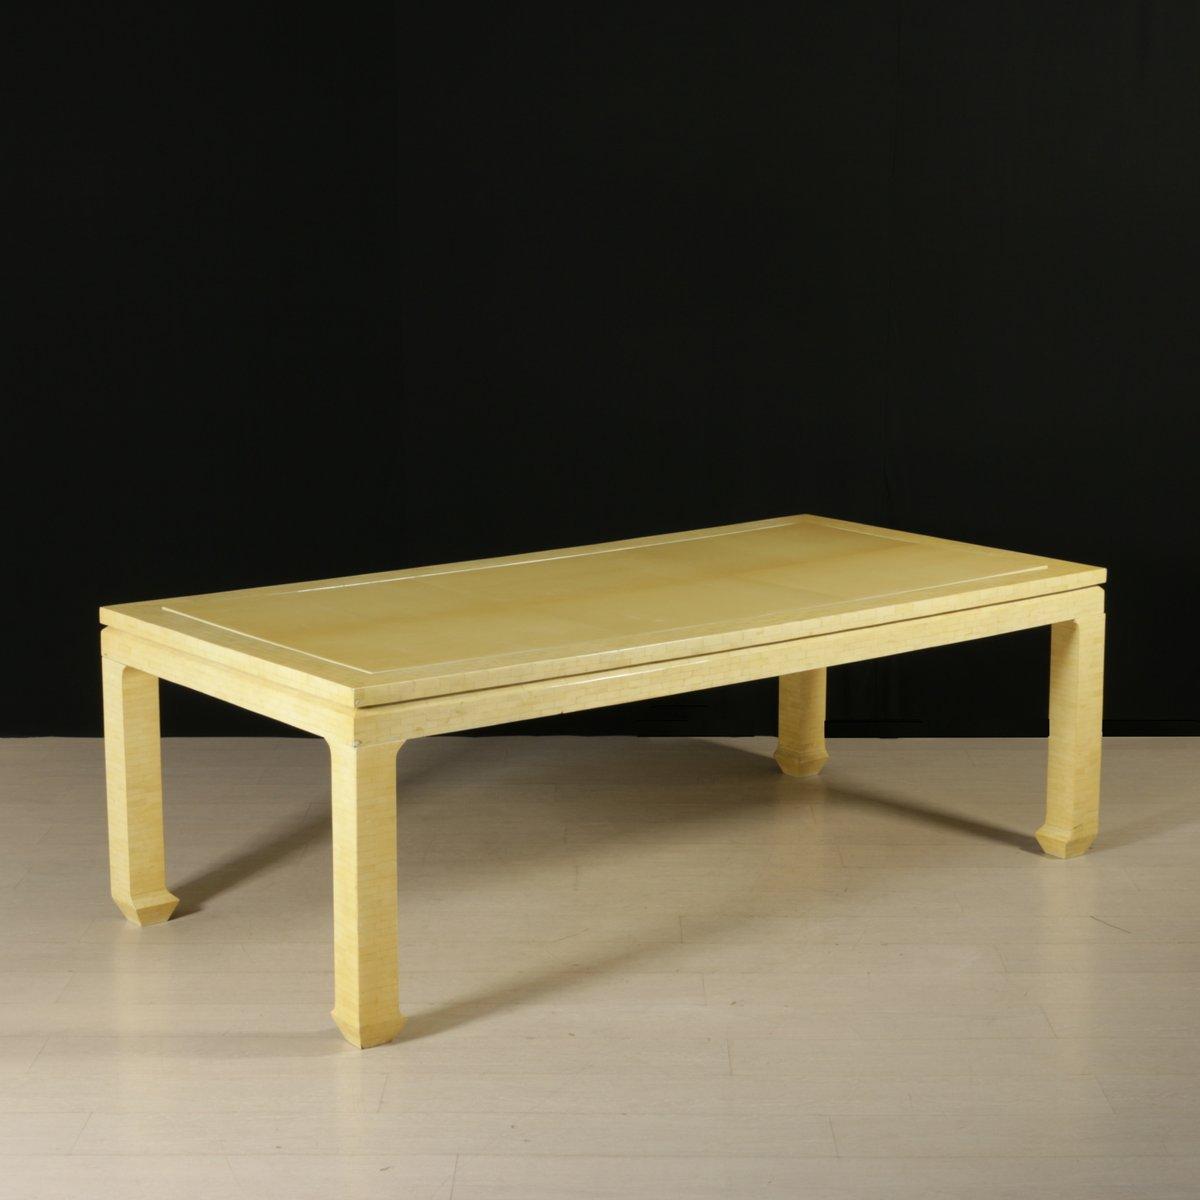 vintage tisch aus holz elfenbein imitat schmiede uwe beer. Black Bedroom Furniture Sets. Home Design Ideas